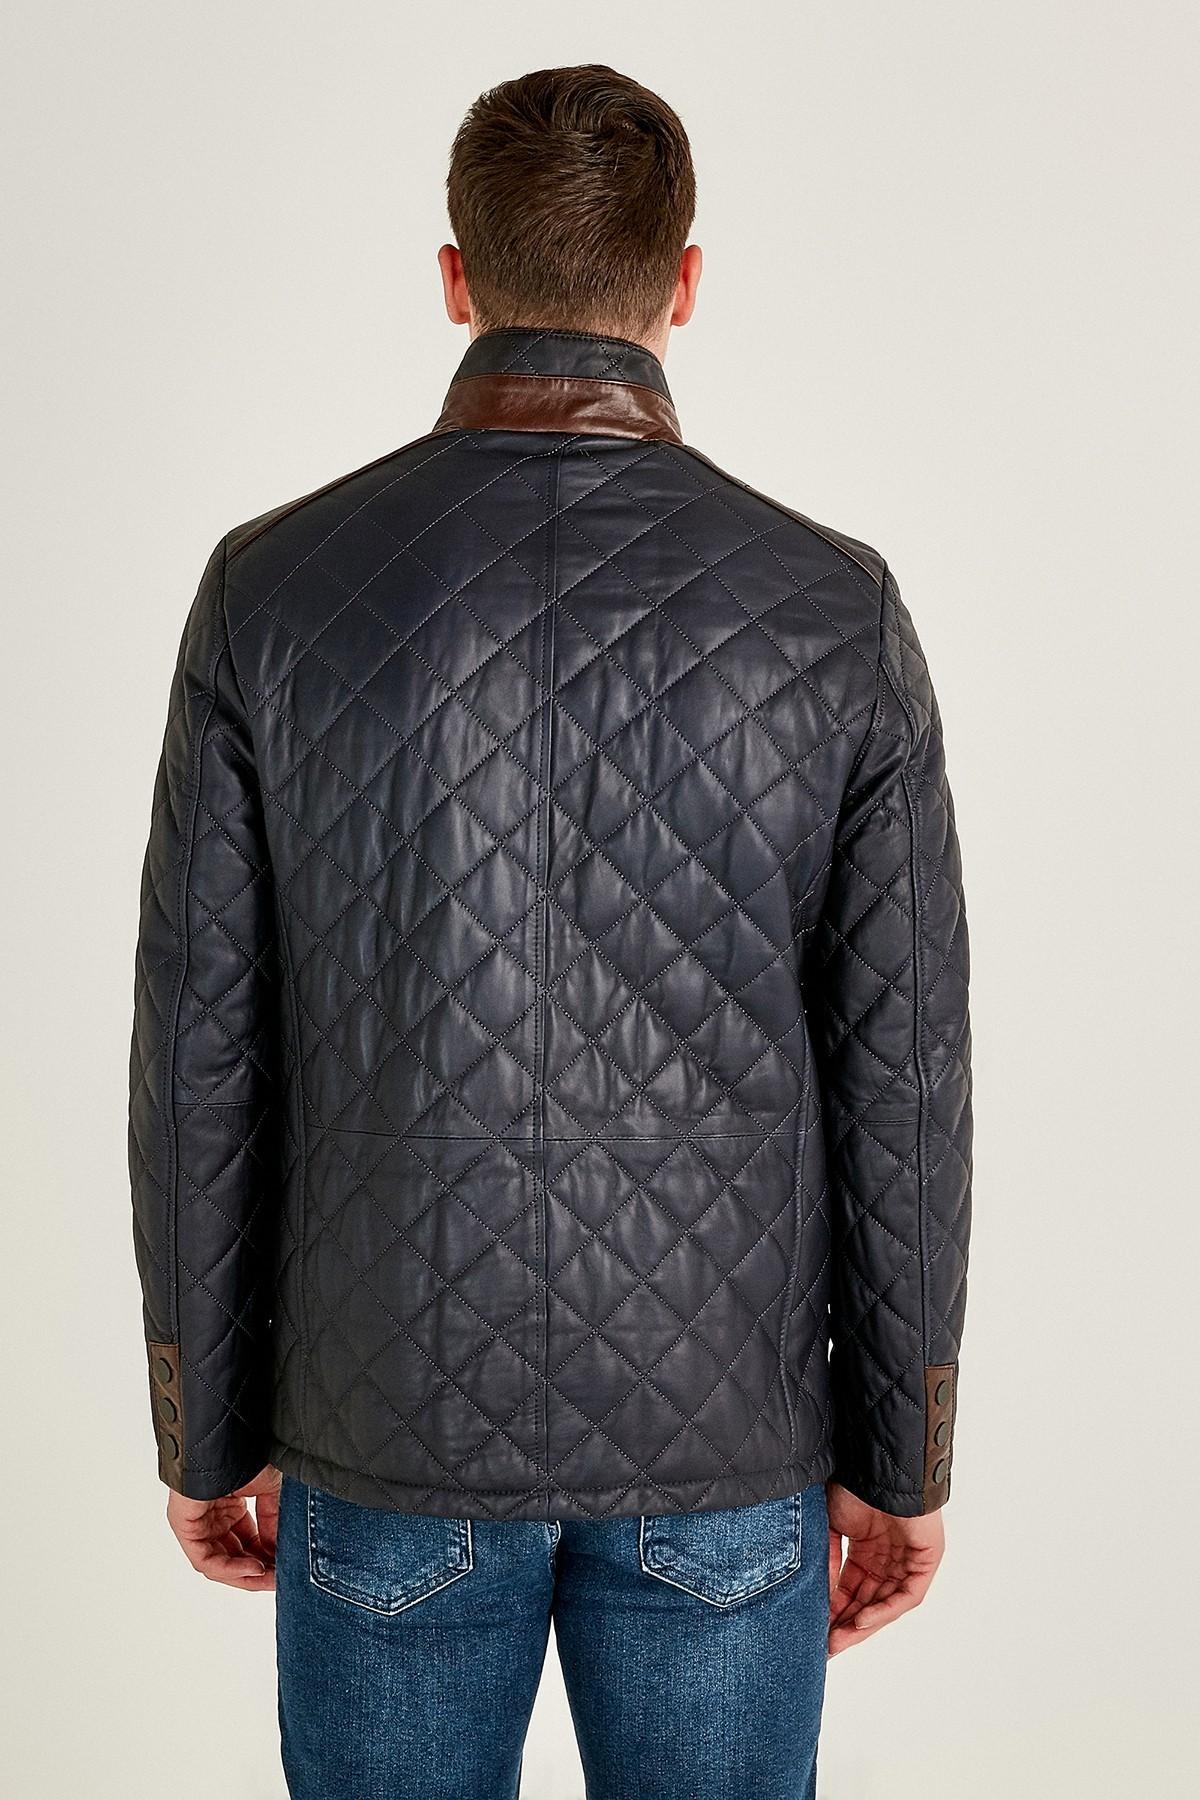 Unique Mens Jackets